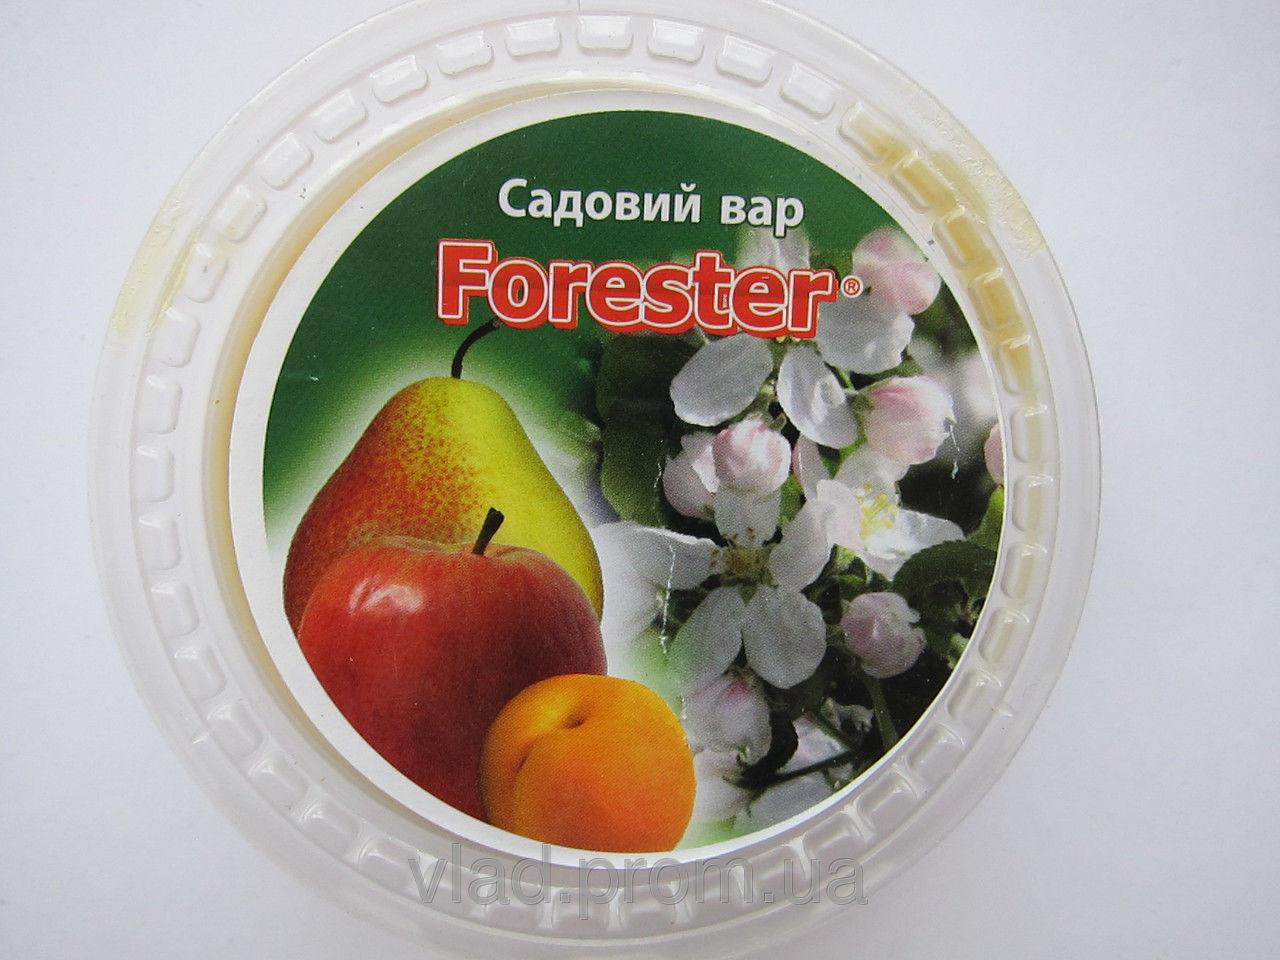 "Садовый вар ""Форестер"", 100 г."